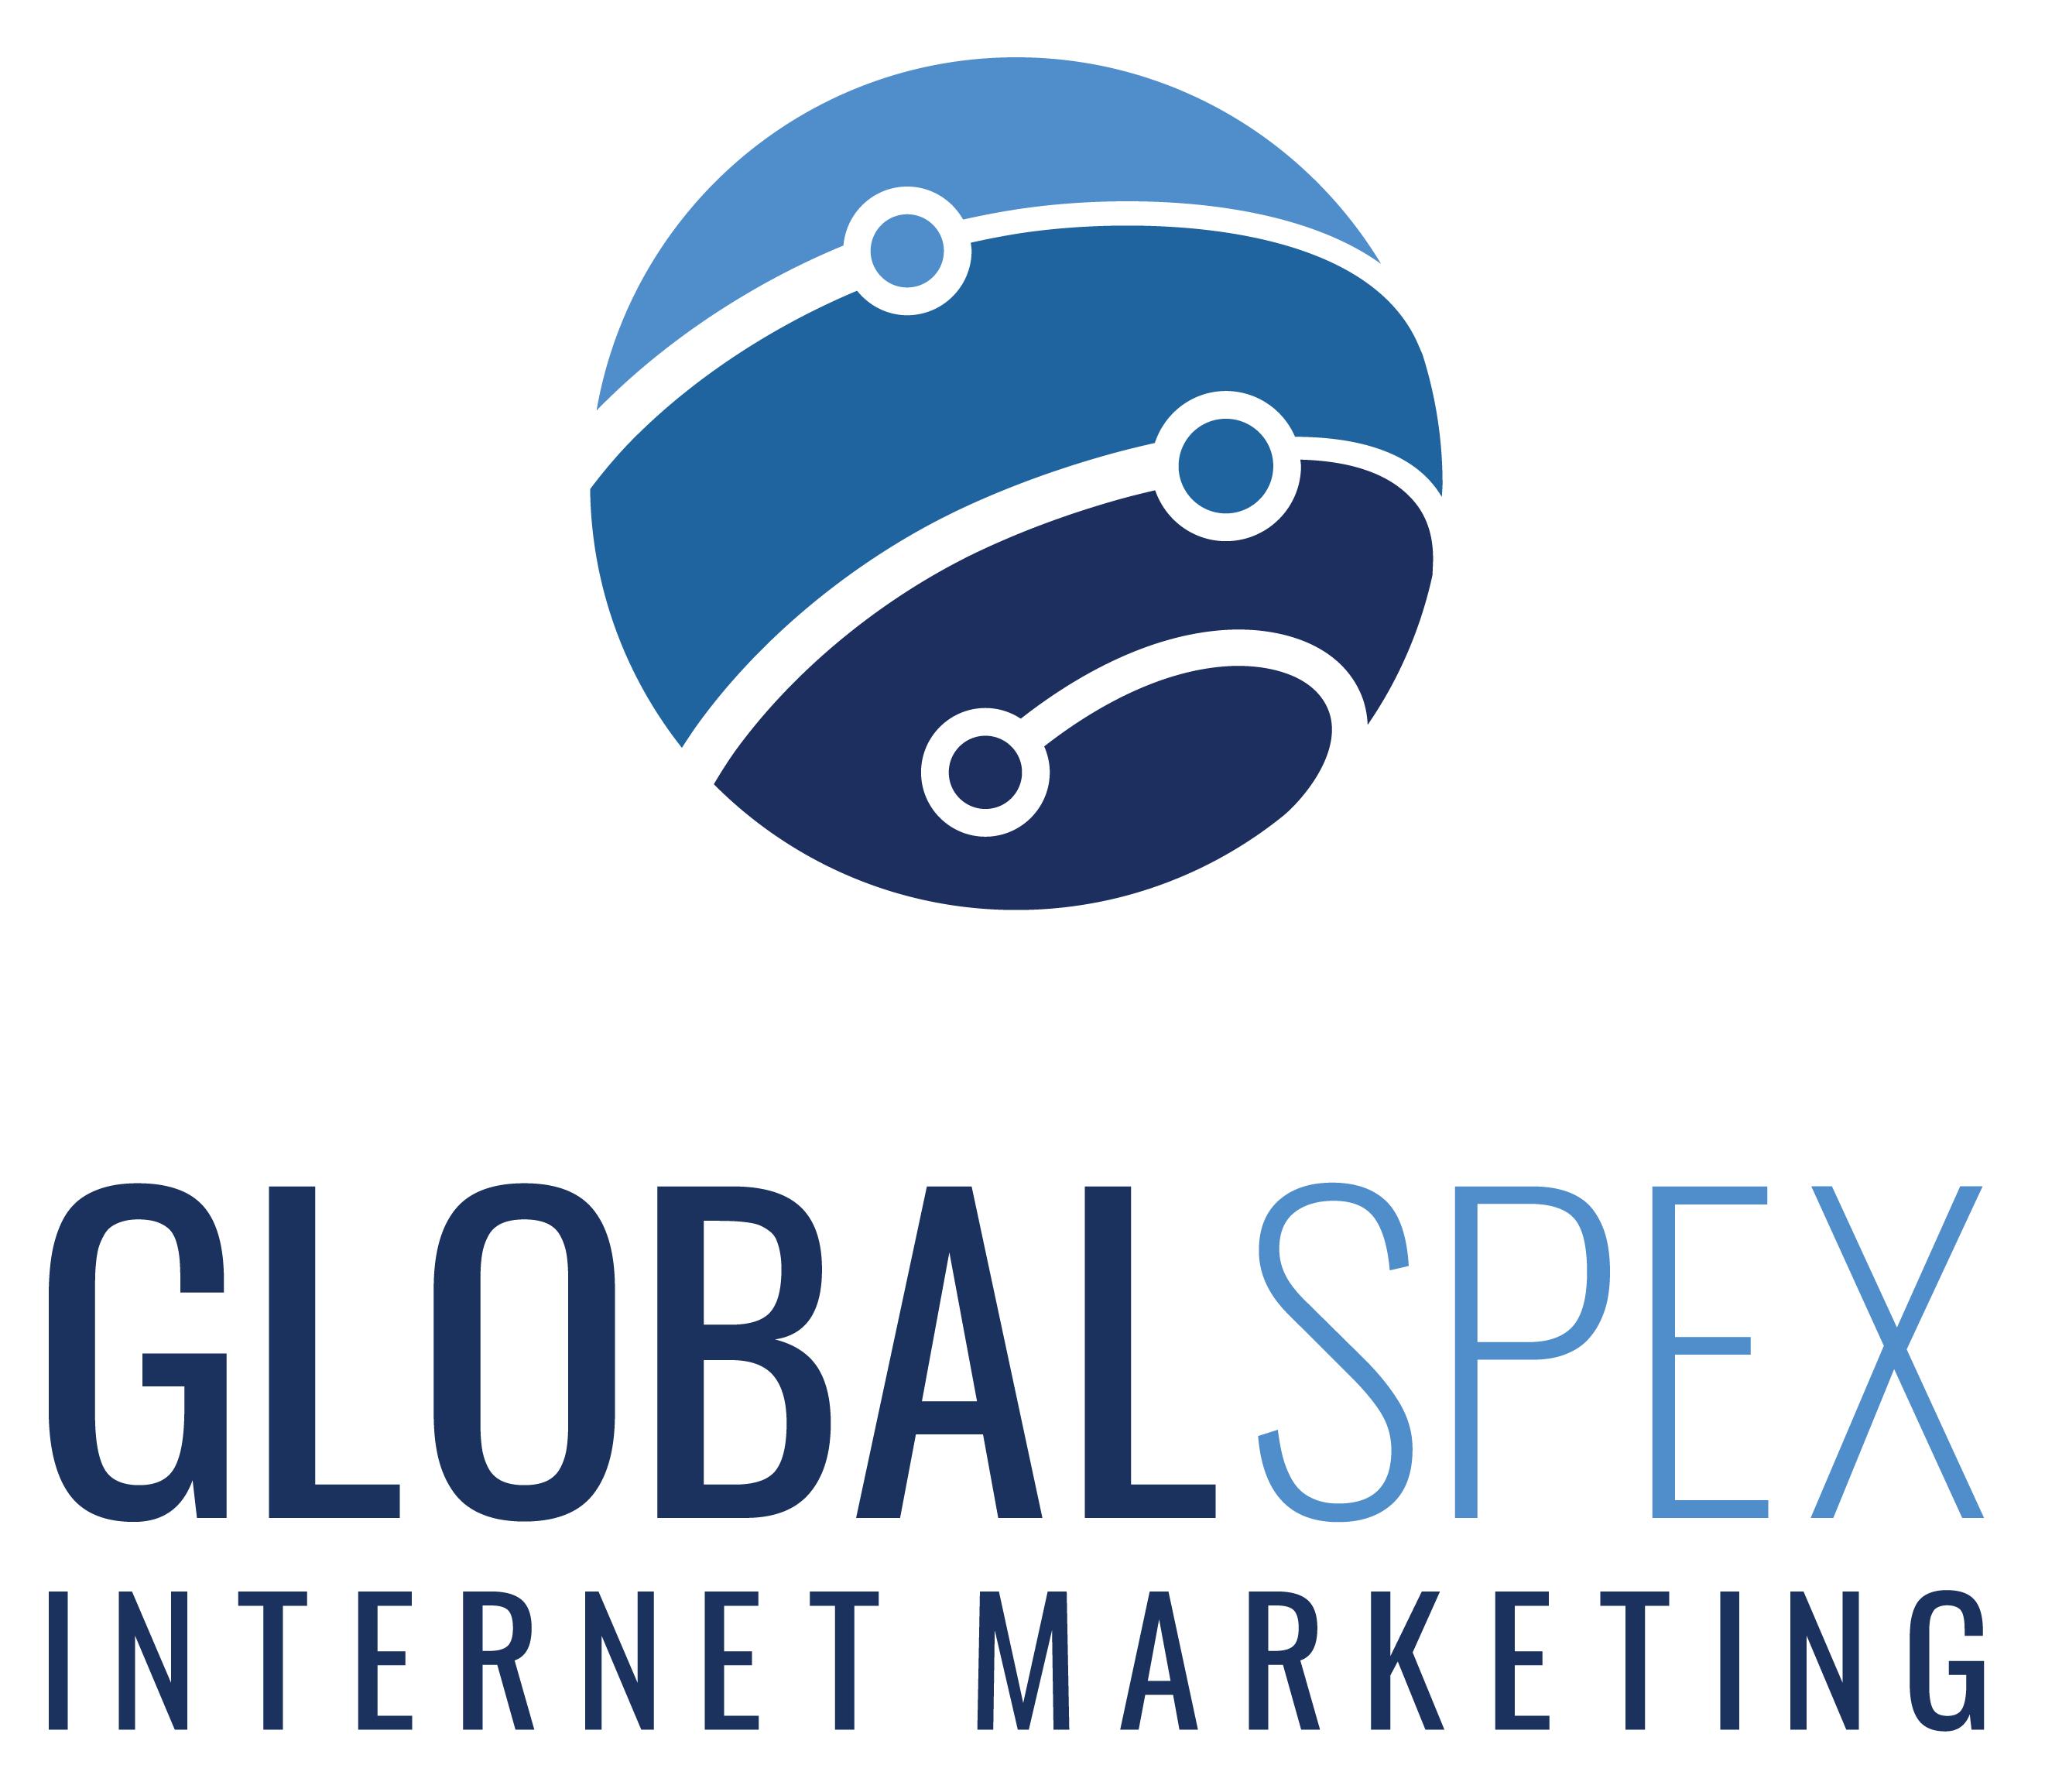 GlobalSpex Internet Marketing